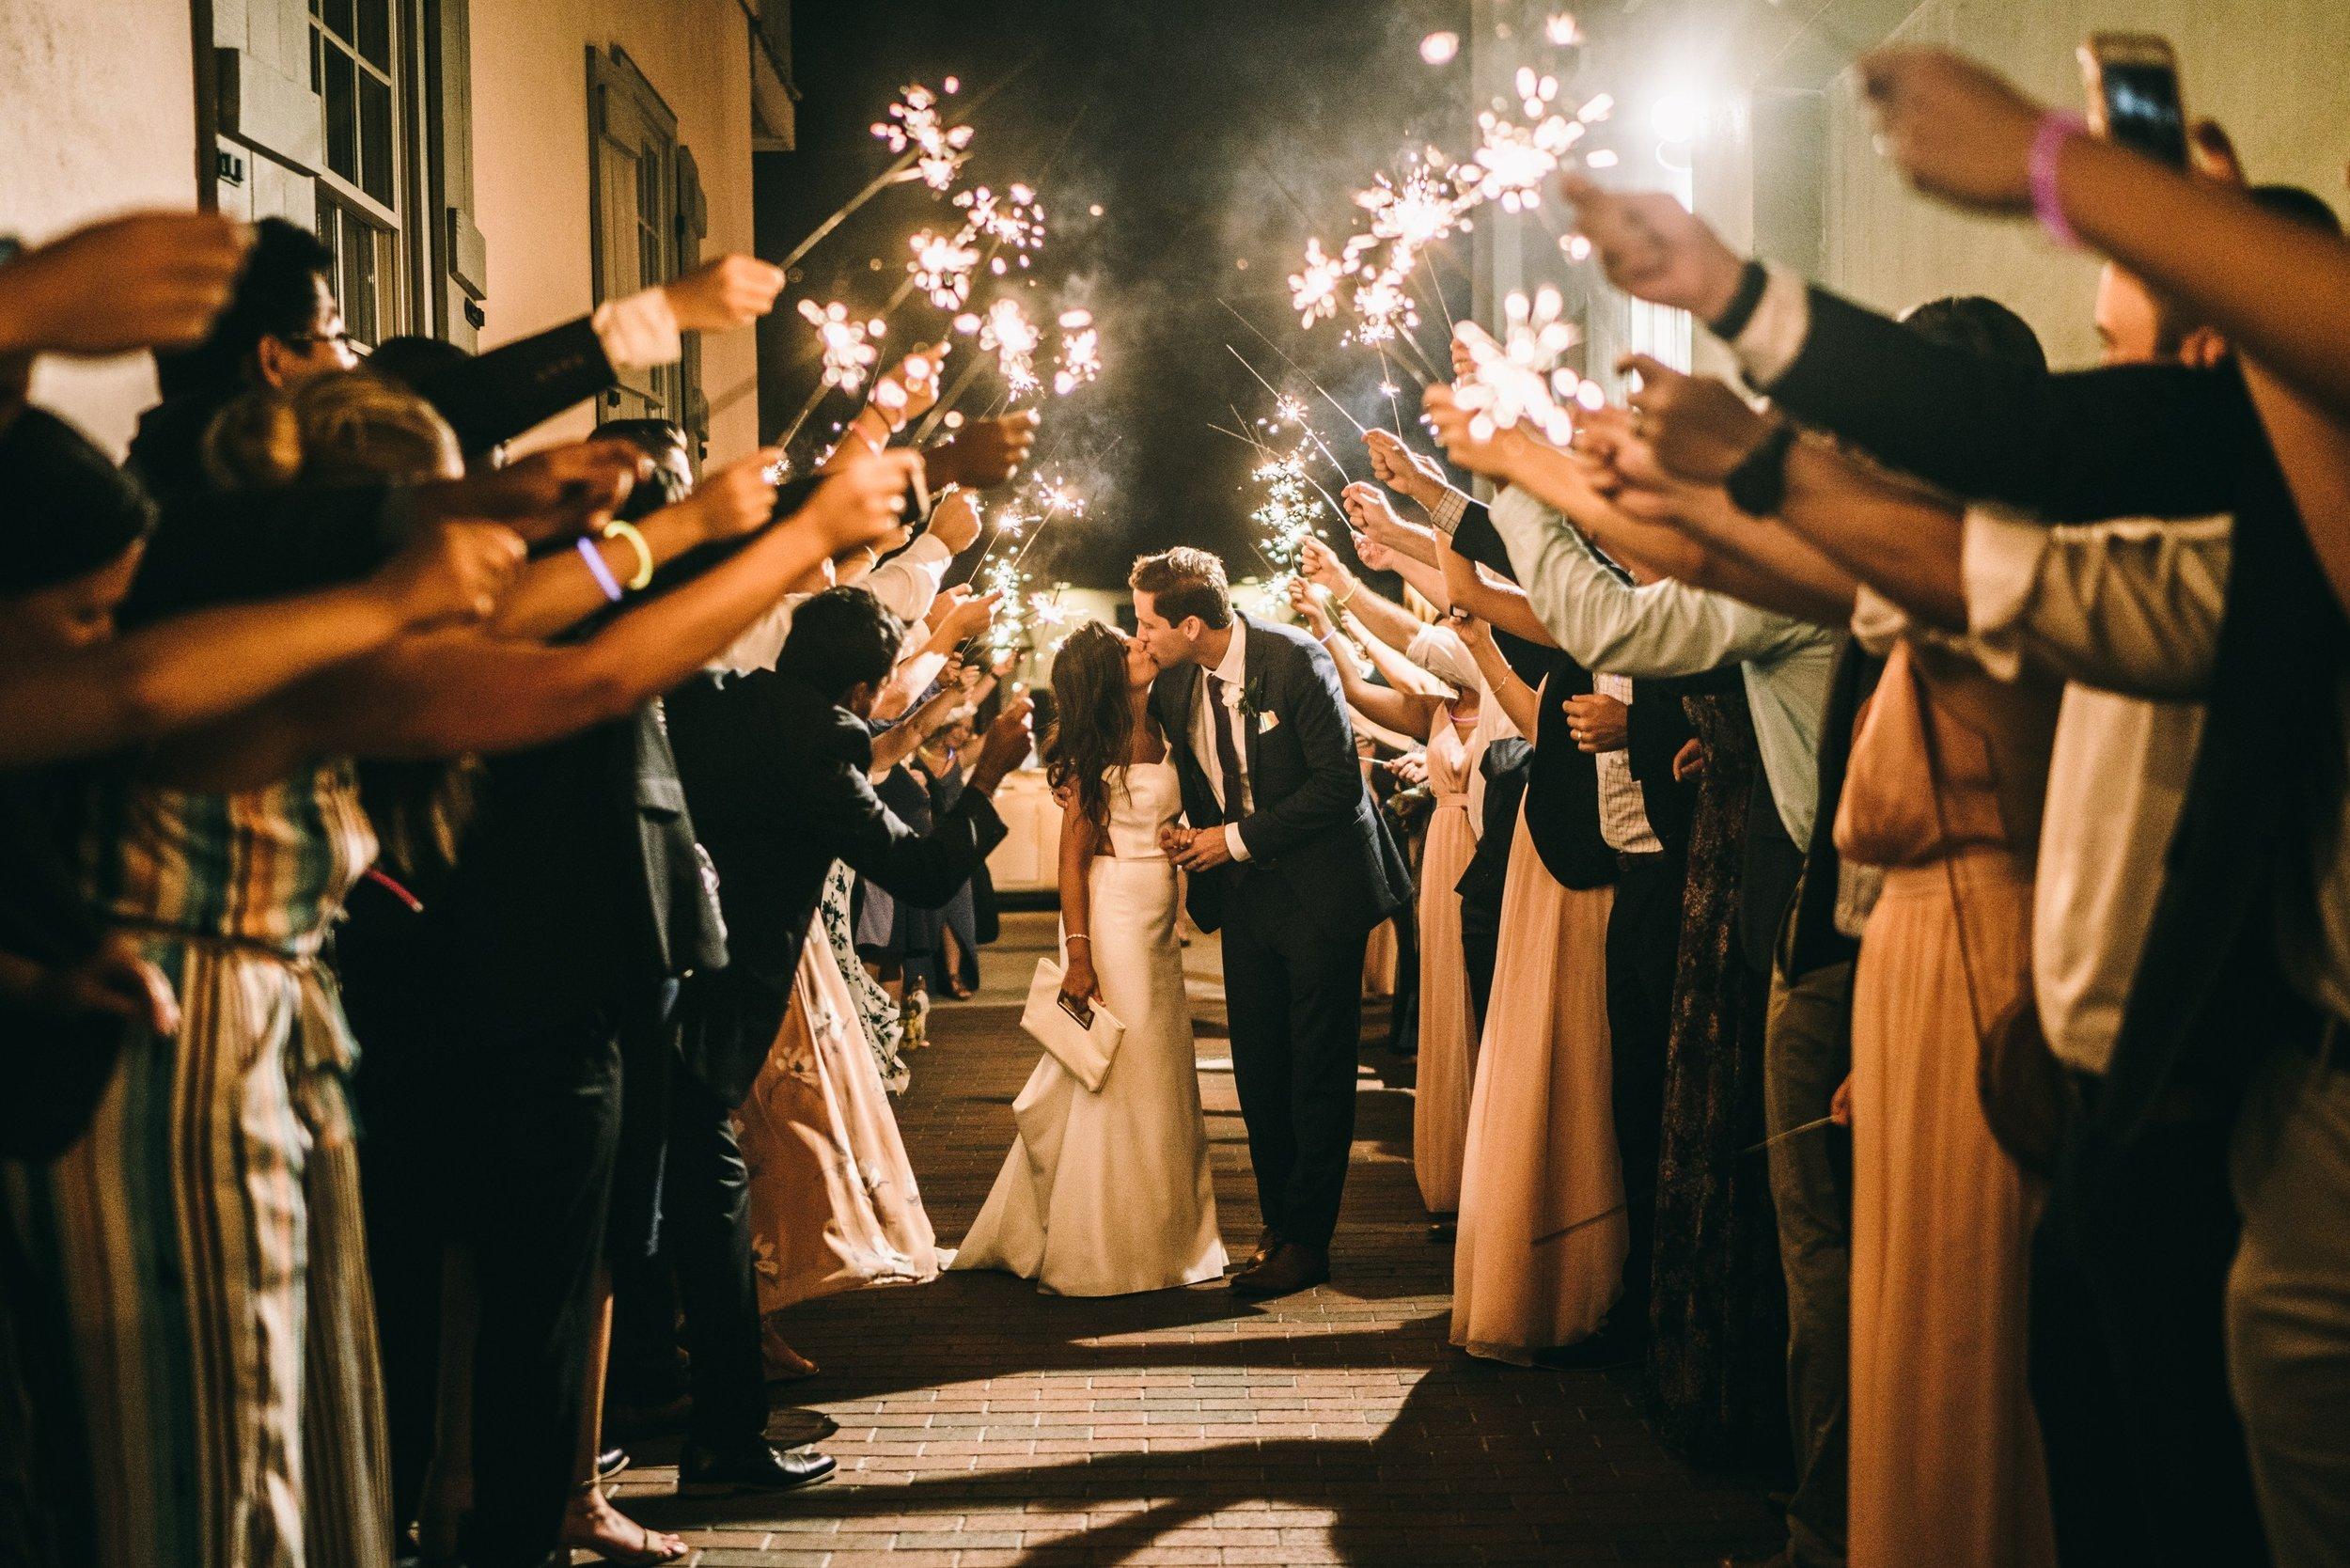 donna-wedding-photographer-mexico-city-taylor-magazine.jpg